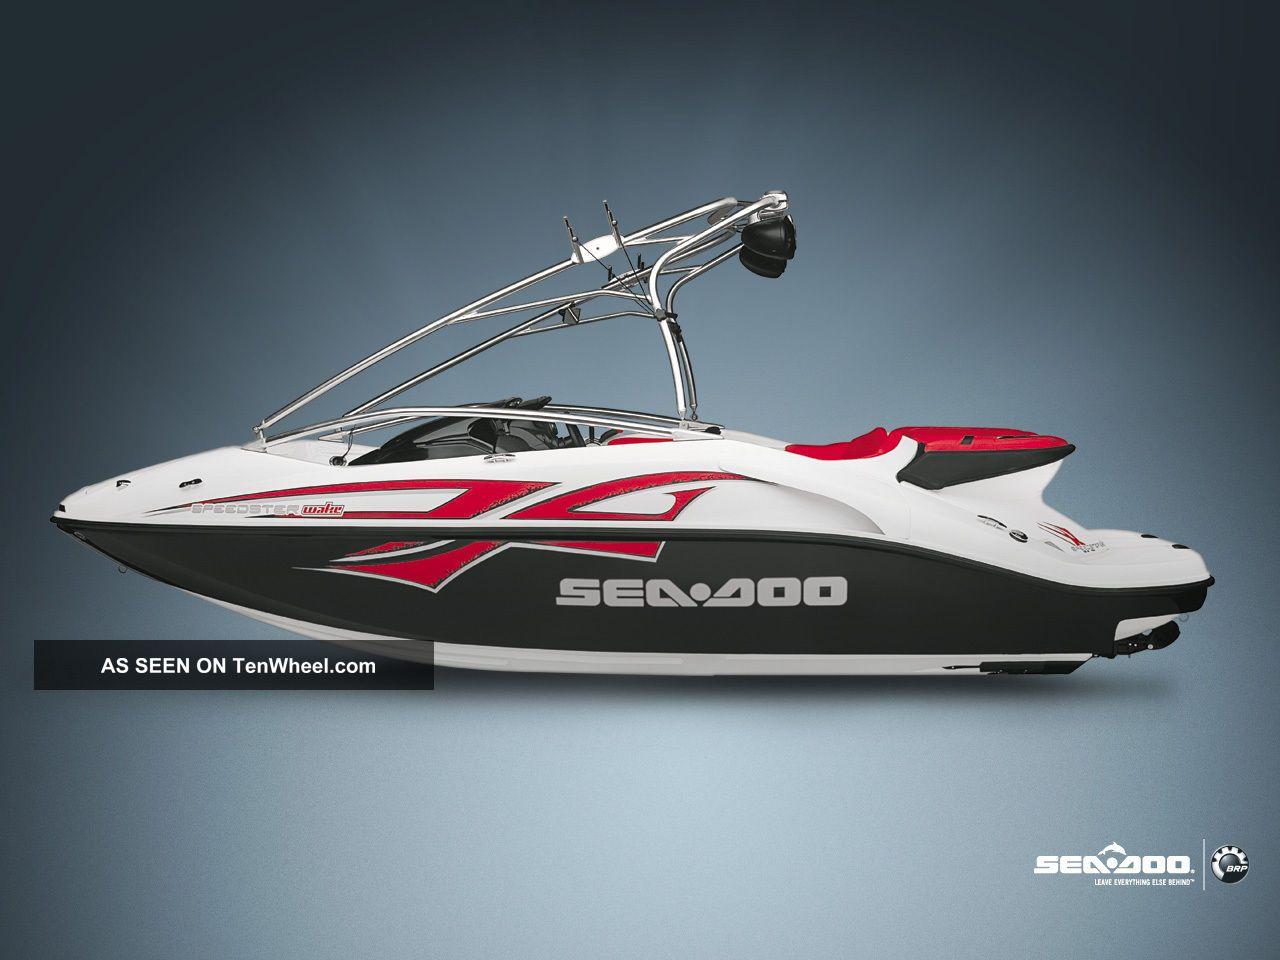 2008 Sea Doo Speedster 200 Wake